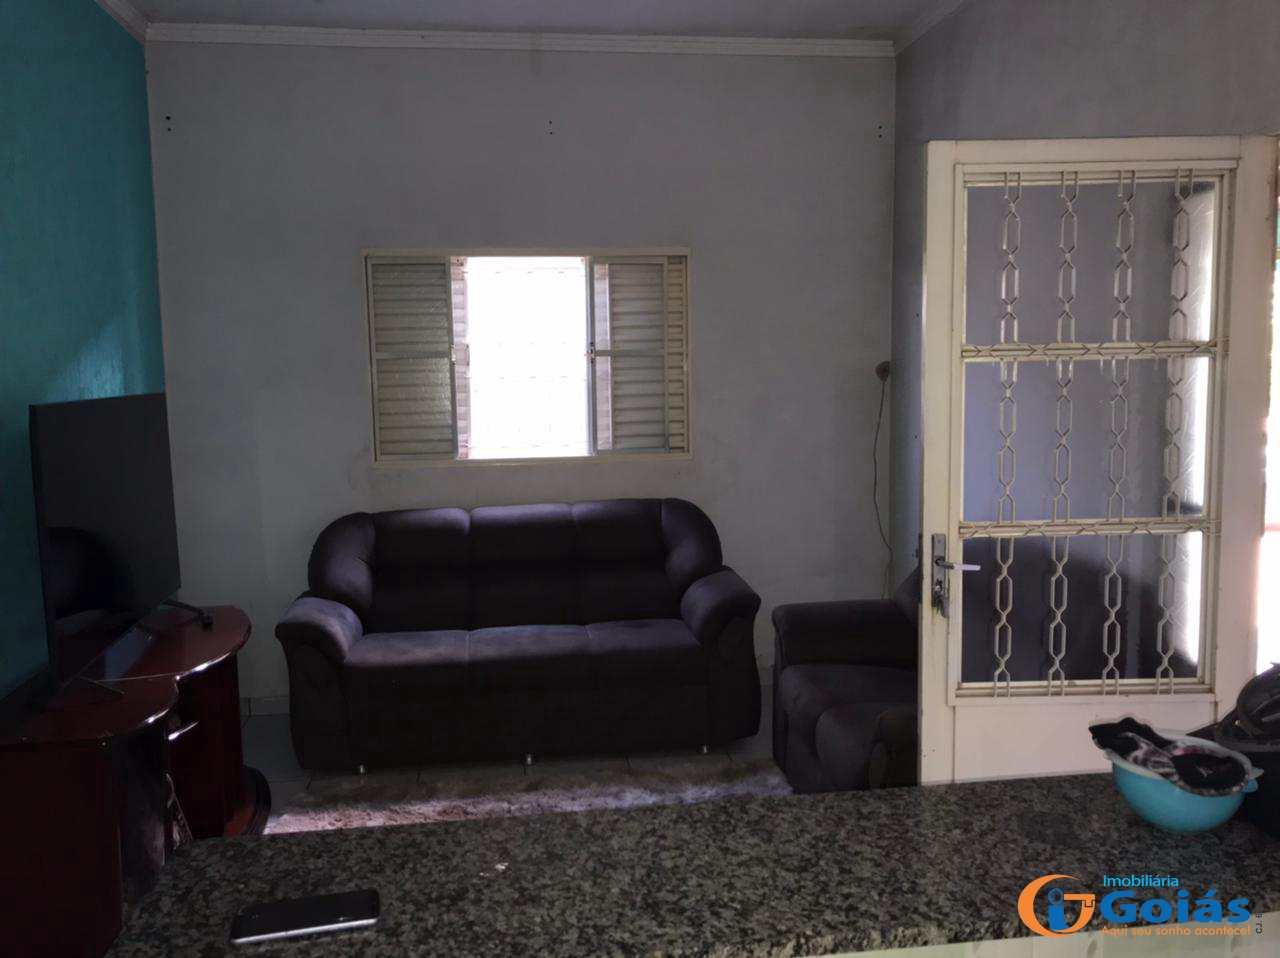 Casa com 3 dorms, Blazi I, Vianópolis - R$ 160 mil, Cod: 9018